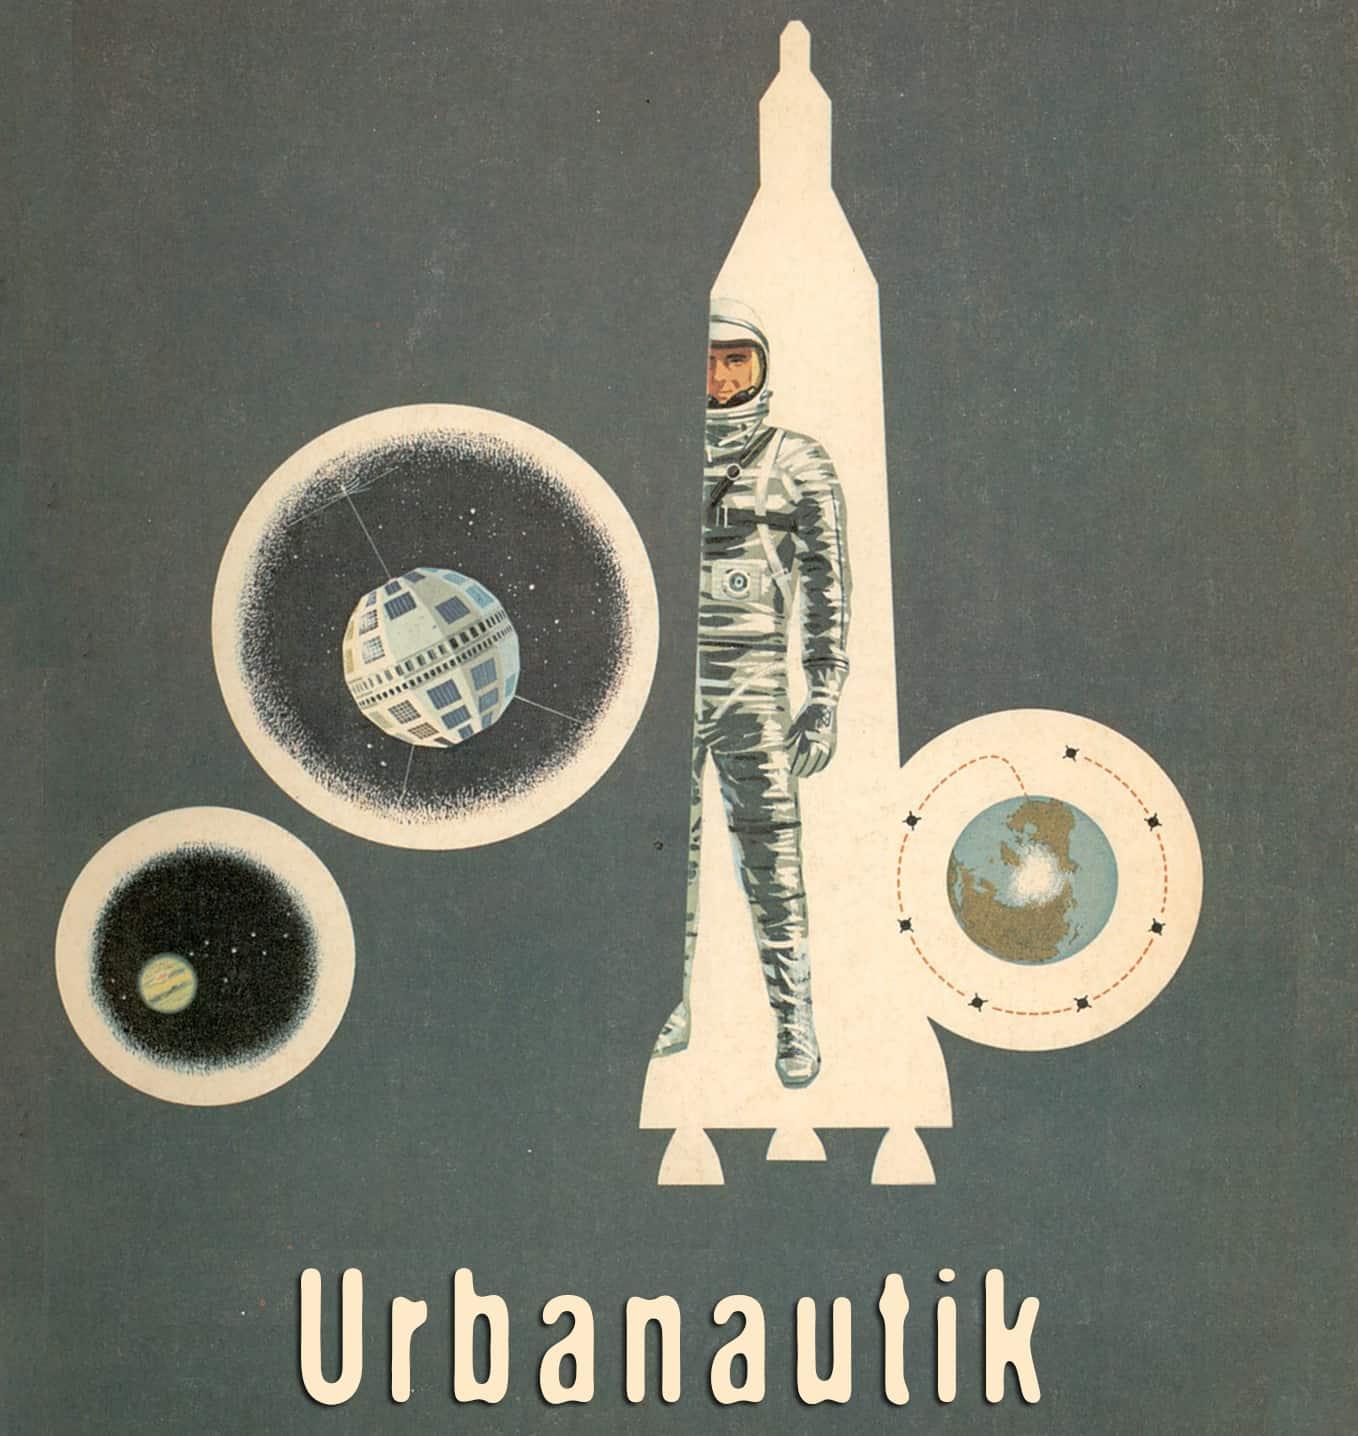 Kultur-Förderprogramm der Stadt Gießen namens Urbanautik - Titelbild